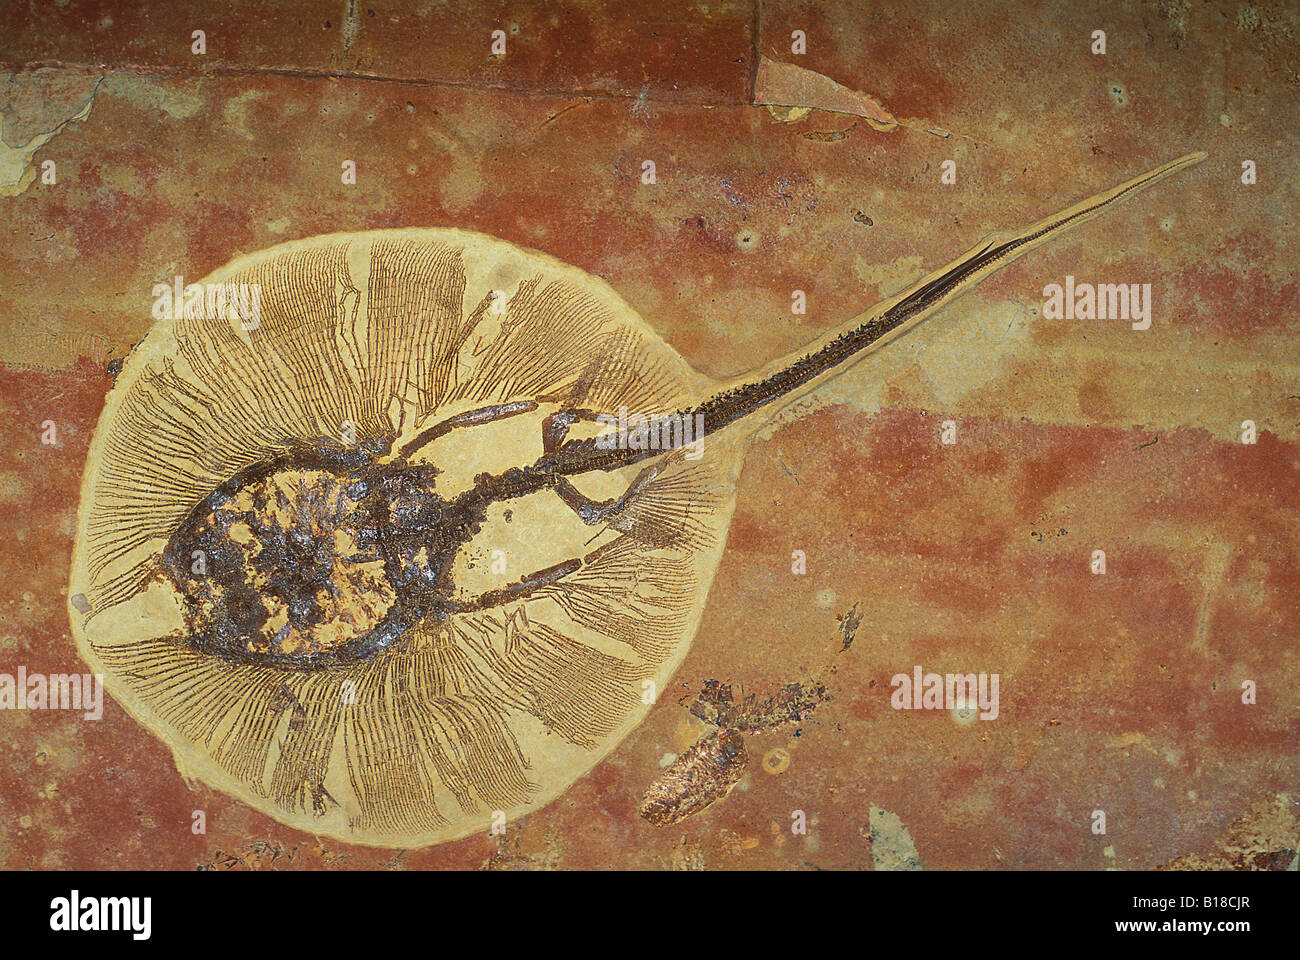 Période de l'Éocène Stingray fossile Photo Stock